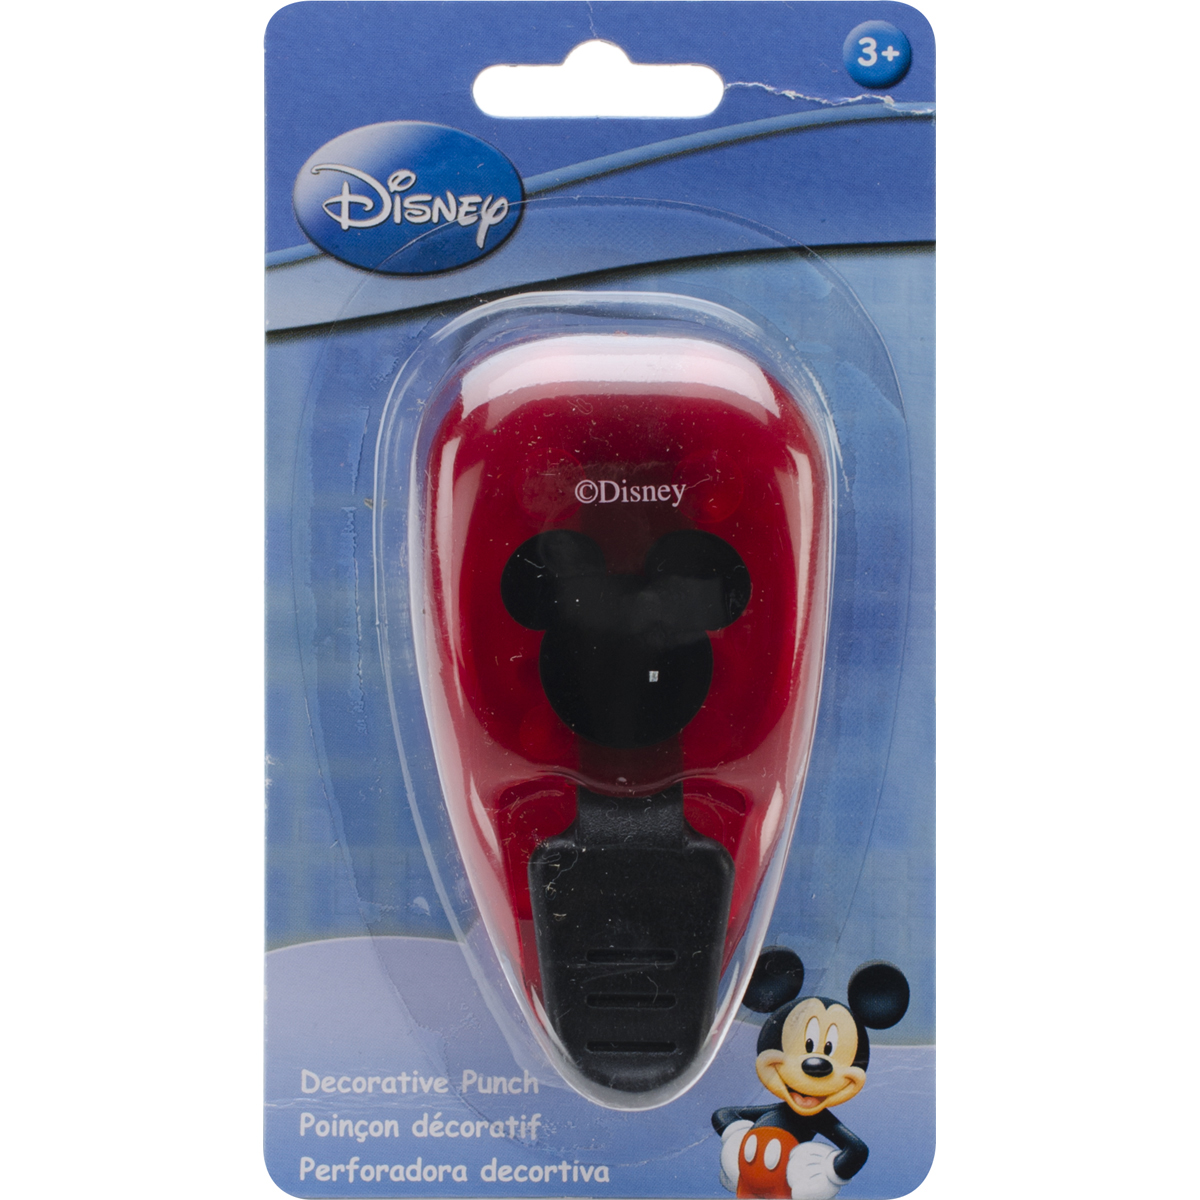 Disney Paper Shapers Medium Punch-Mickey Icon, 1